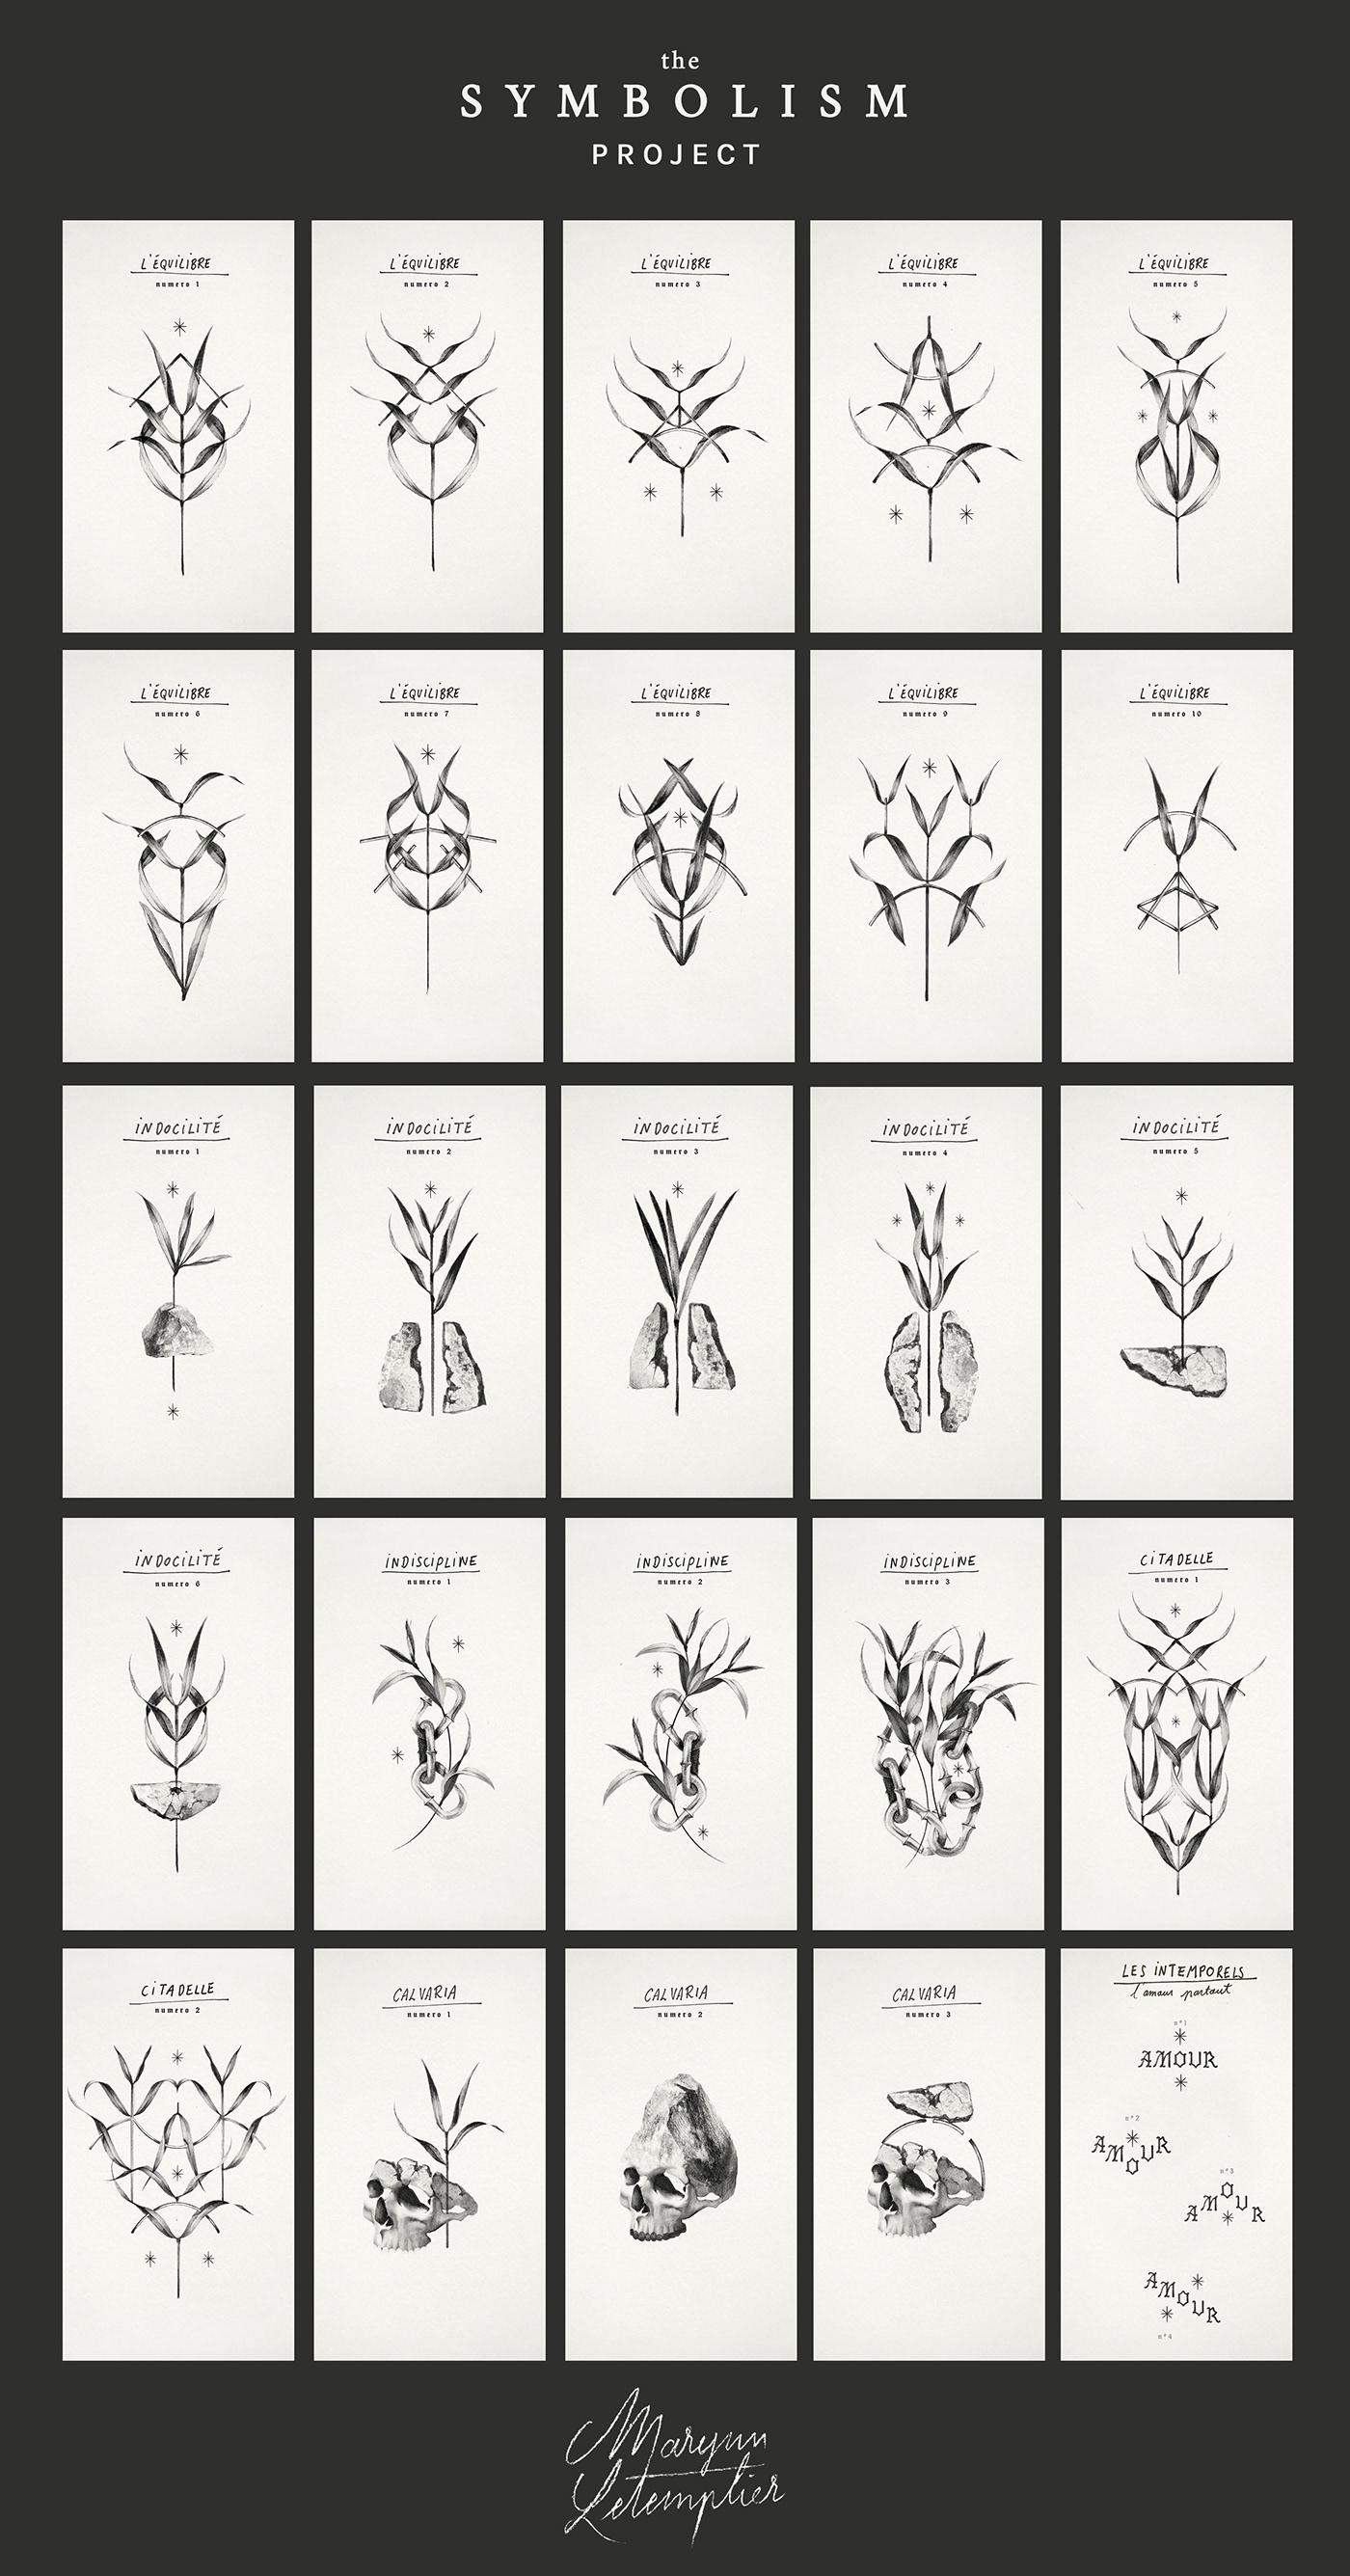 Image may contain: cartoon, pattern and drawing